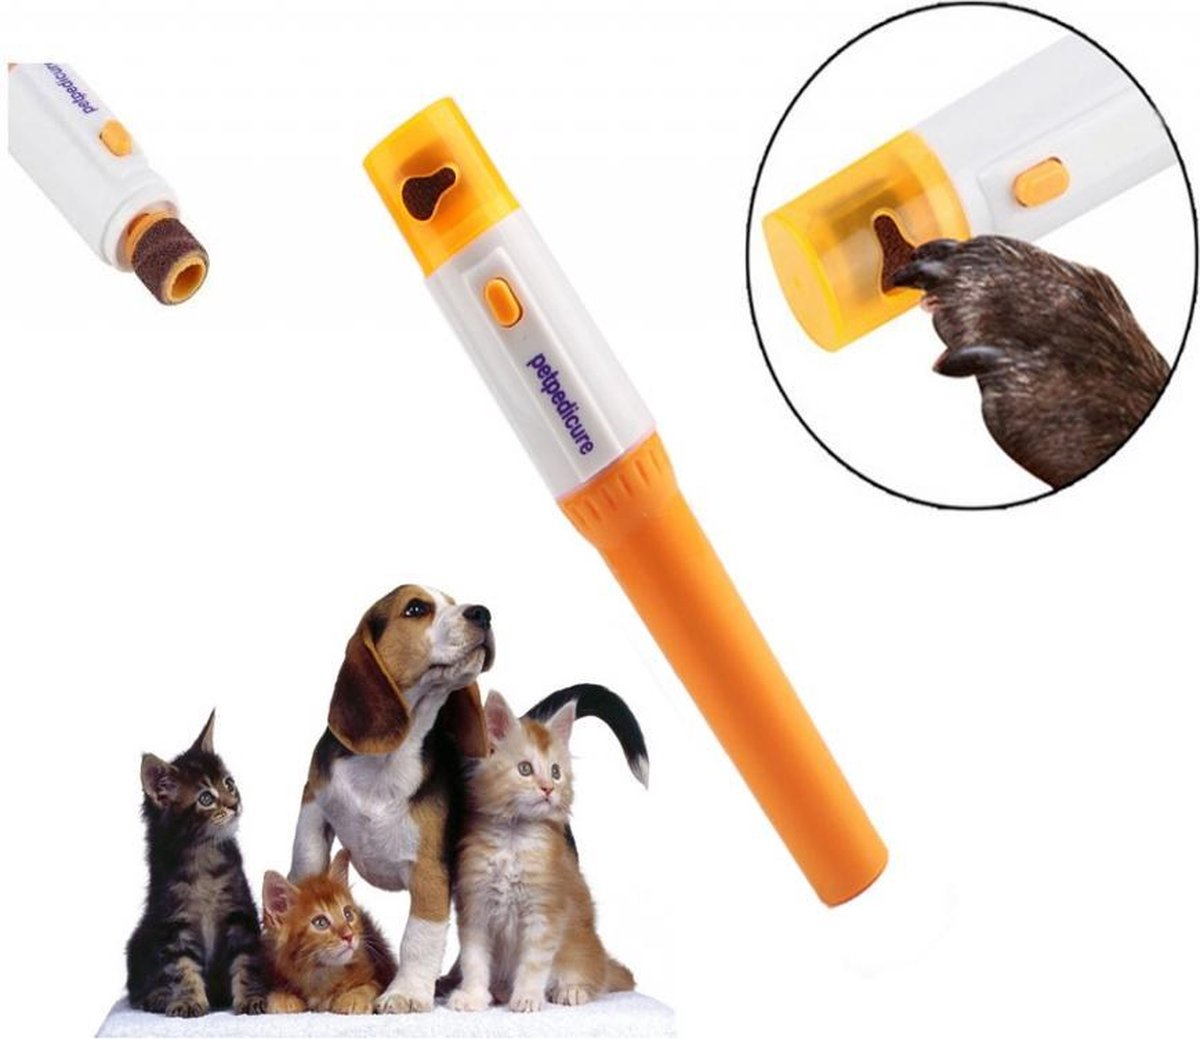 Petpedicure Draadloze Elektrische Nagelvijl - Hond/Kat - Pets